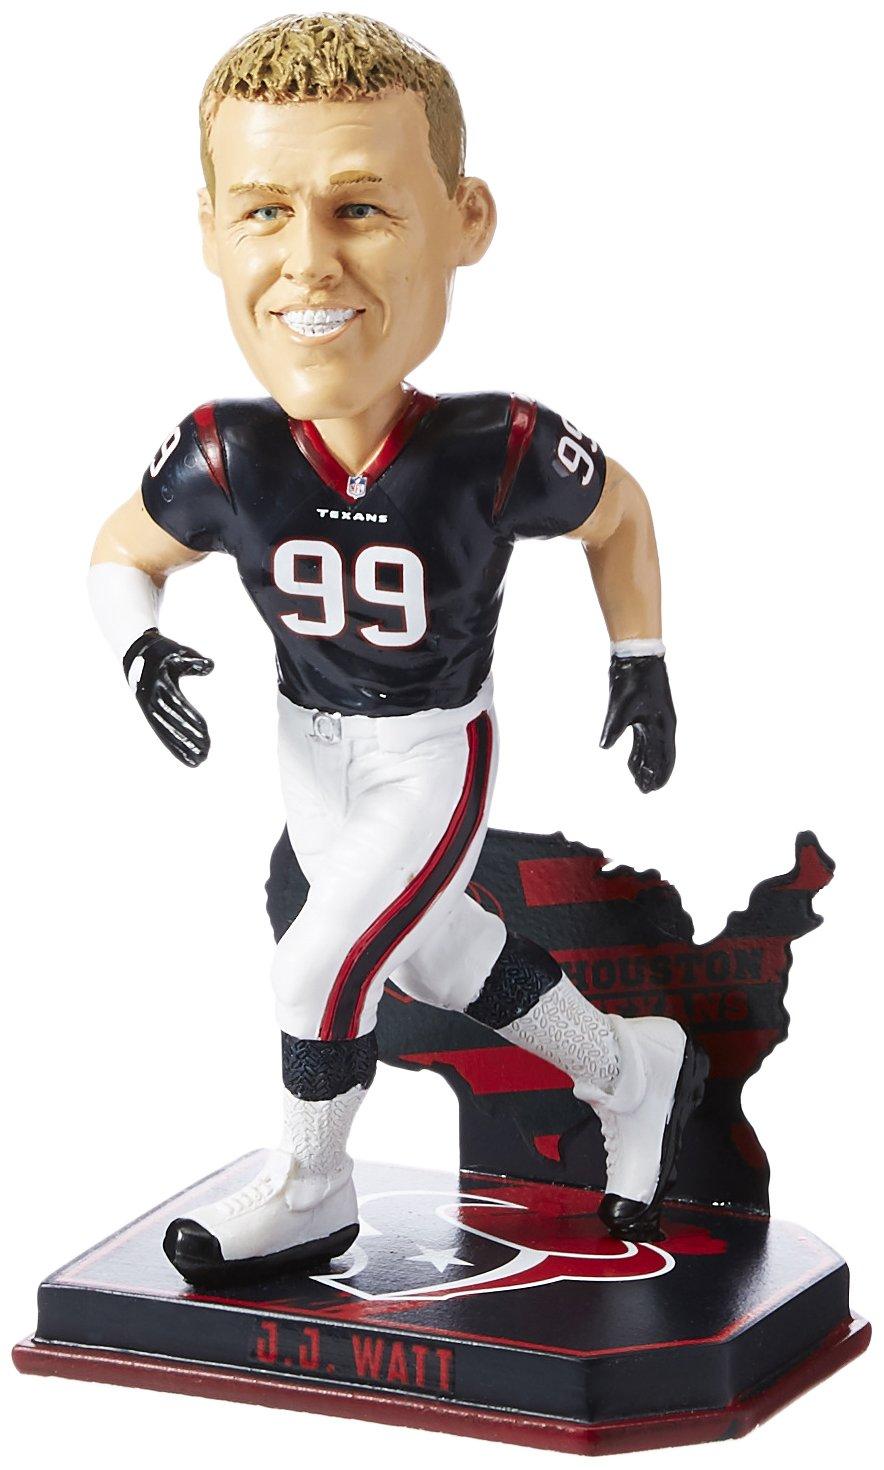 FOCO Houston Texans Watt J. #99 Nation Bobble